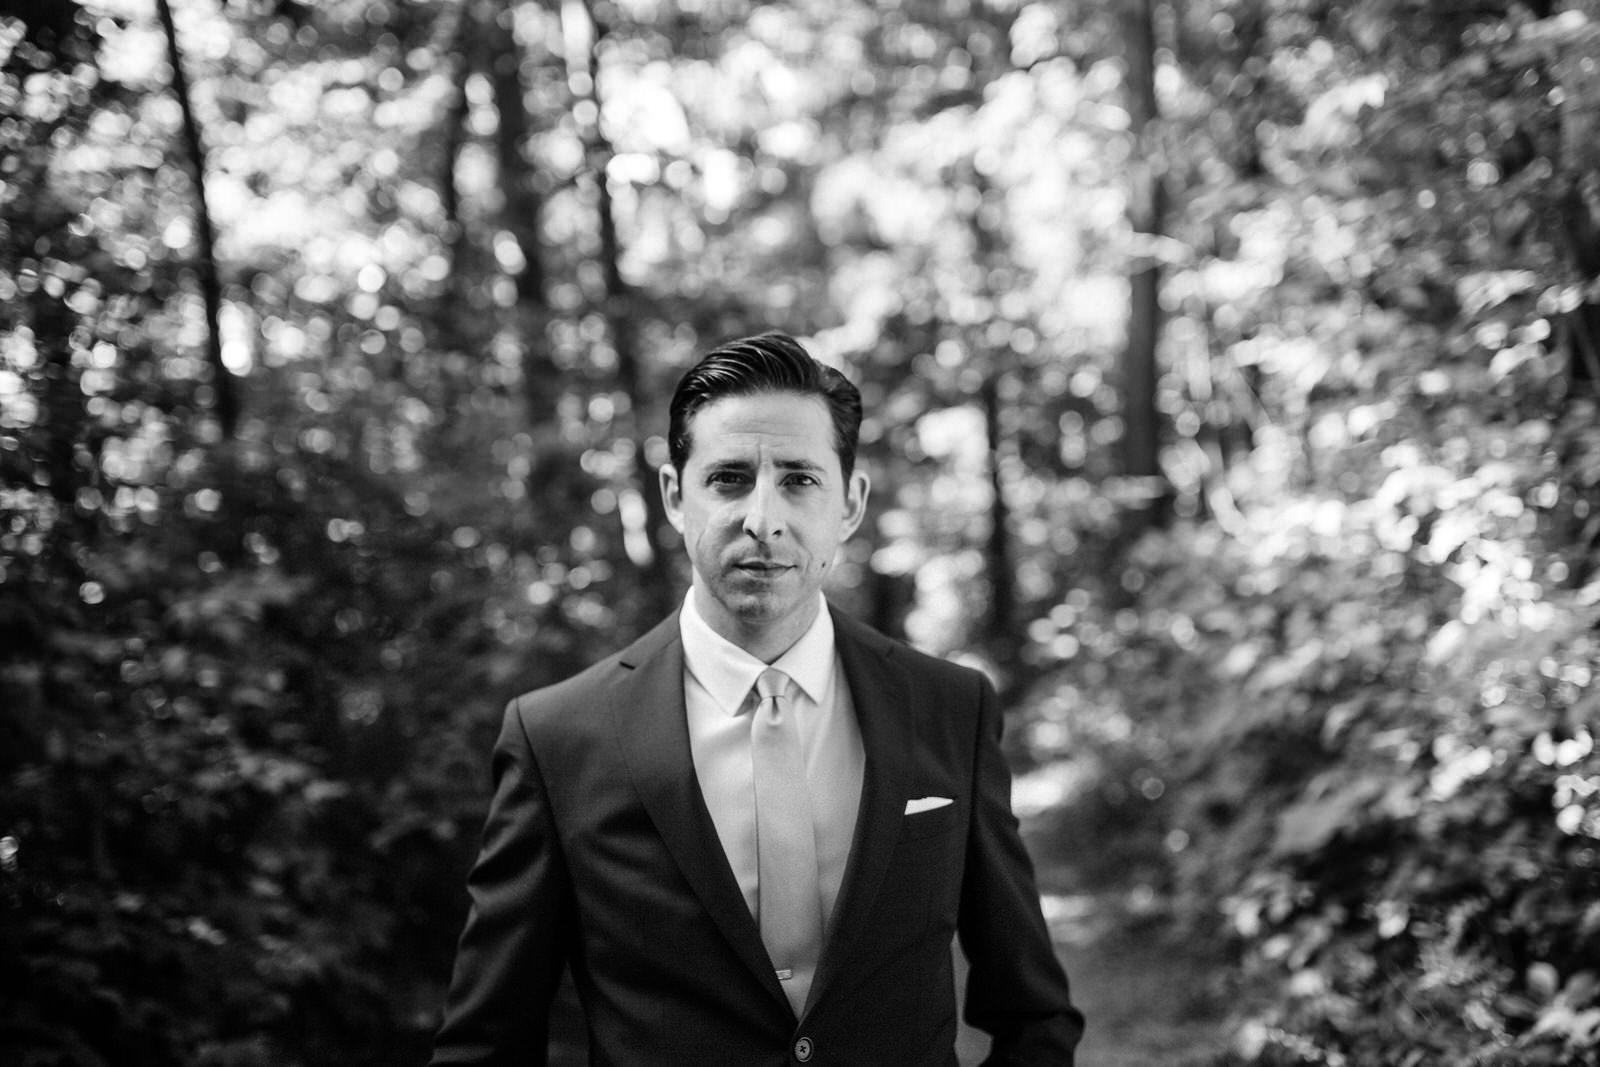 Portland Oregon Wedding Photographer Union pier Michigan wedding0020 .JPG